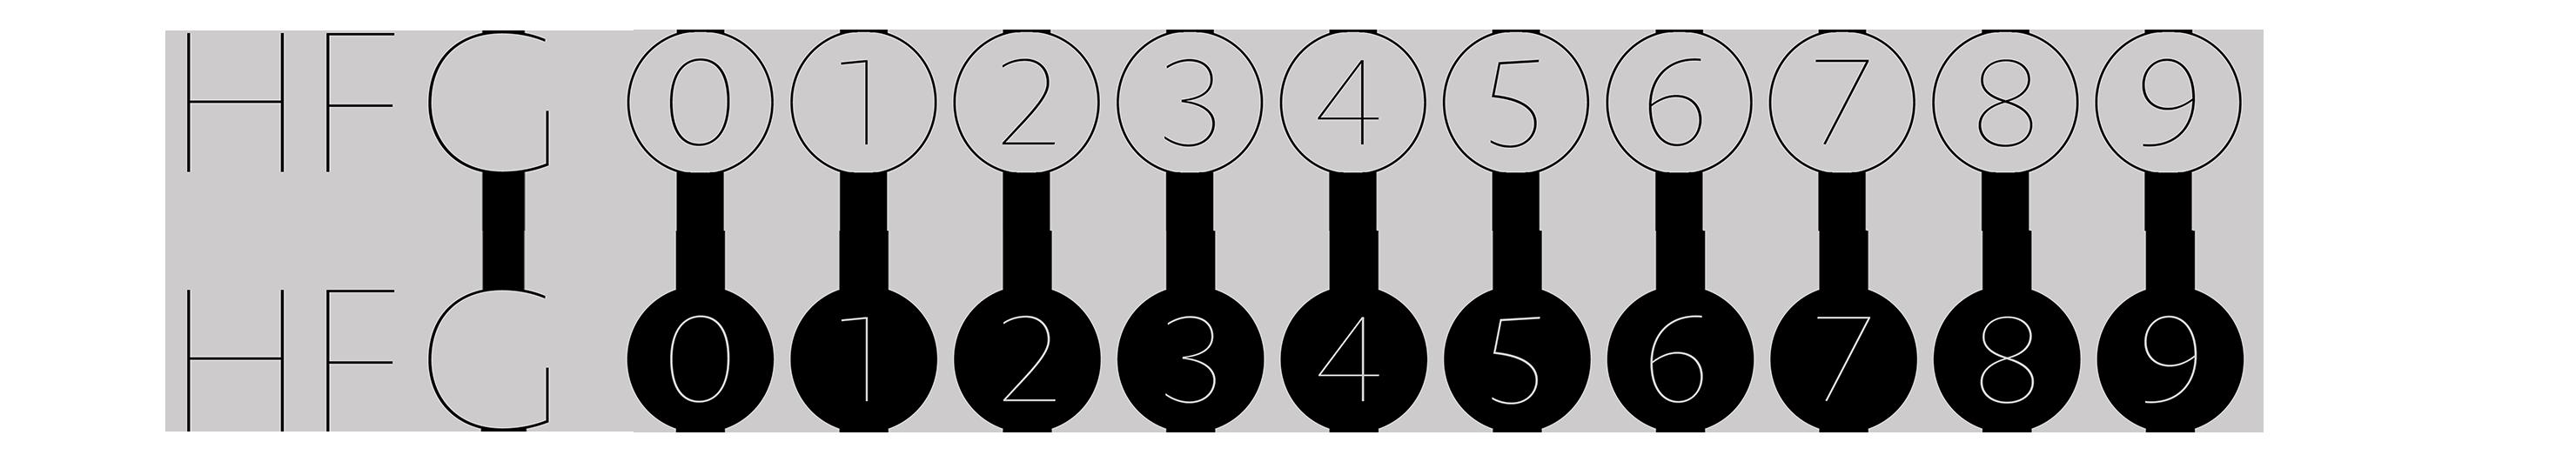 Typeface-Novel-Sans-Hairline-F20-Atlas-Font-Foundry